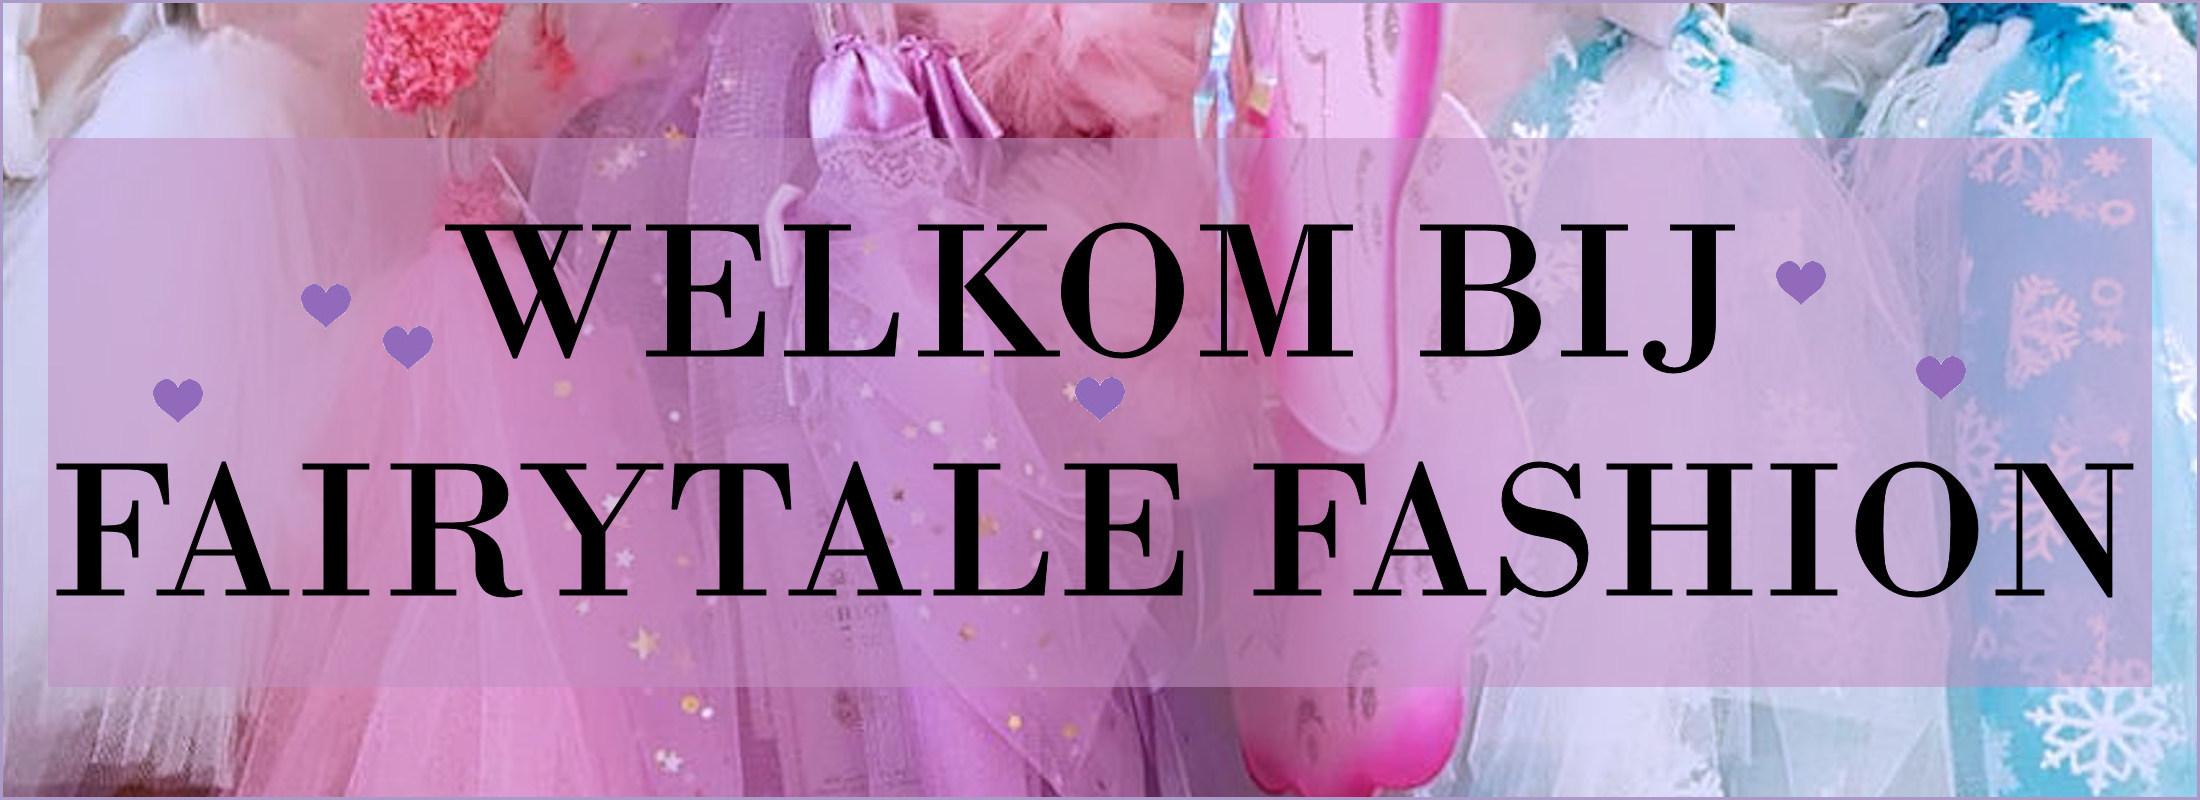 Welkom bij Fairytale Fashion